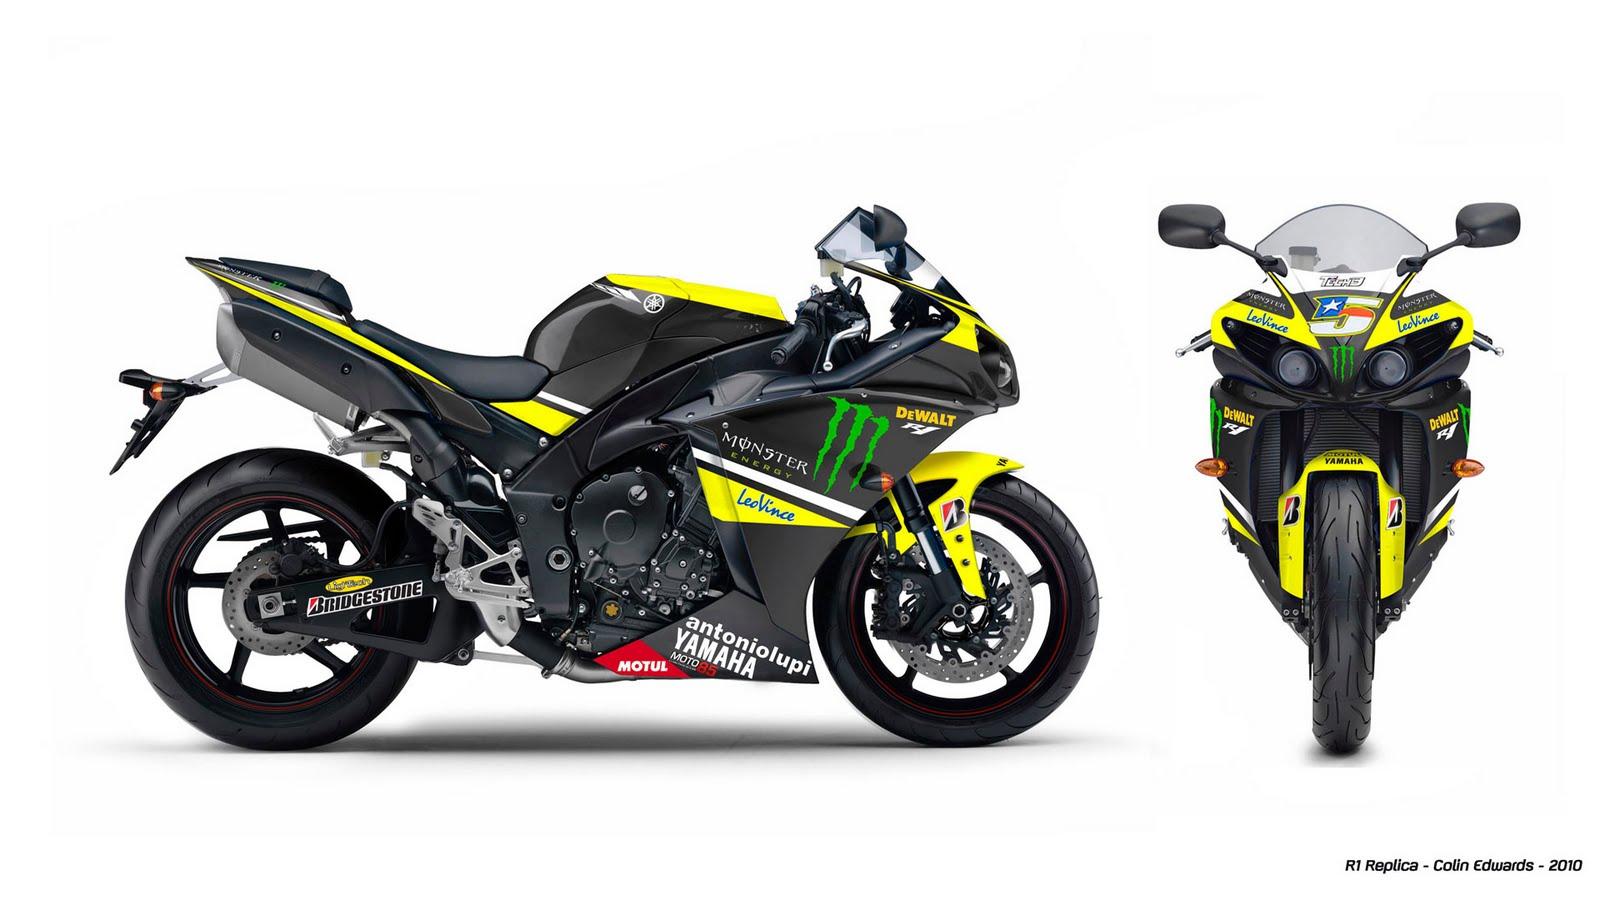 http://2.bp.blogspot.com/_J3_liDBfbvs/S_KBNApRzZI/AAAAAAAAr4E/txFrDf2X4F4/s1600/2010-Yamaha-YZF-R1-Colin-Edwards-Race-Replica-Motorcycle.jpg